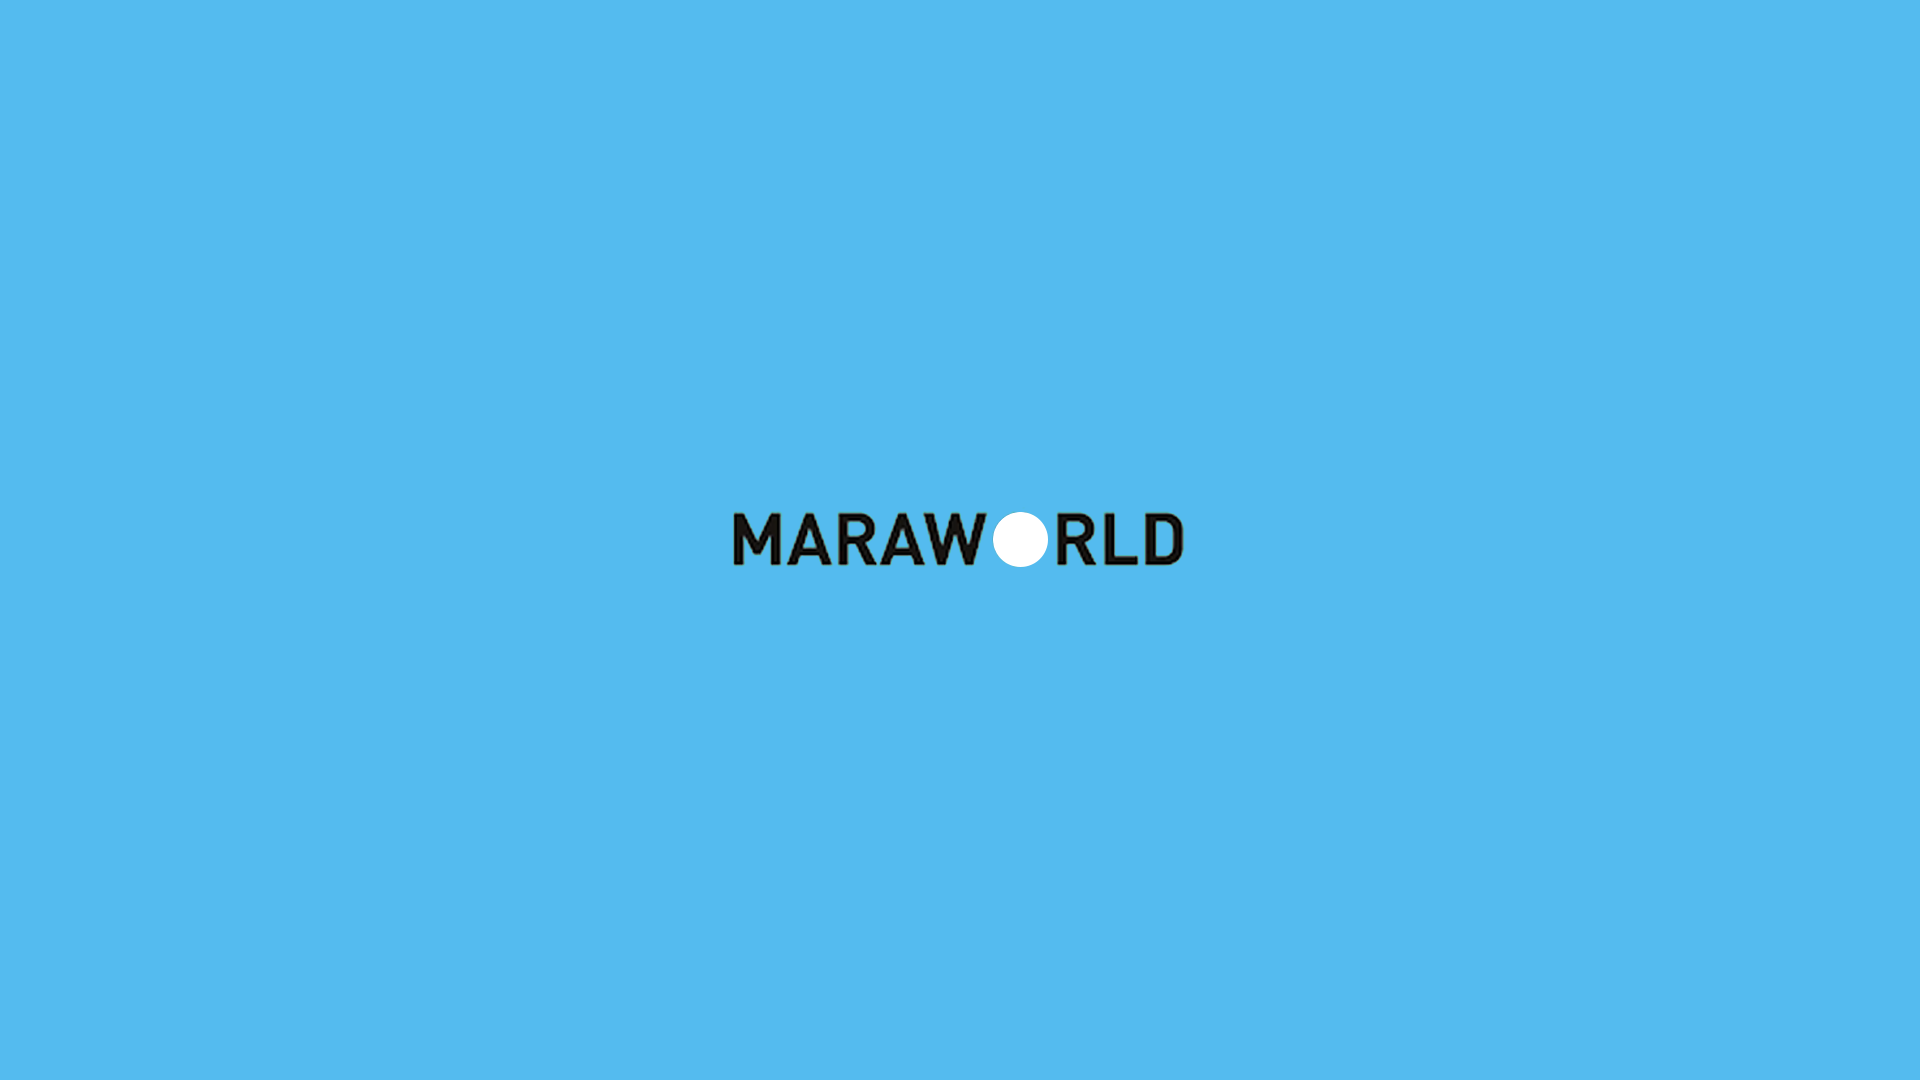 Maraworld